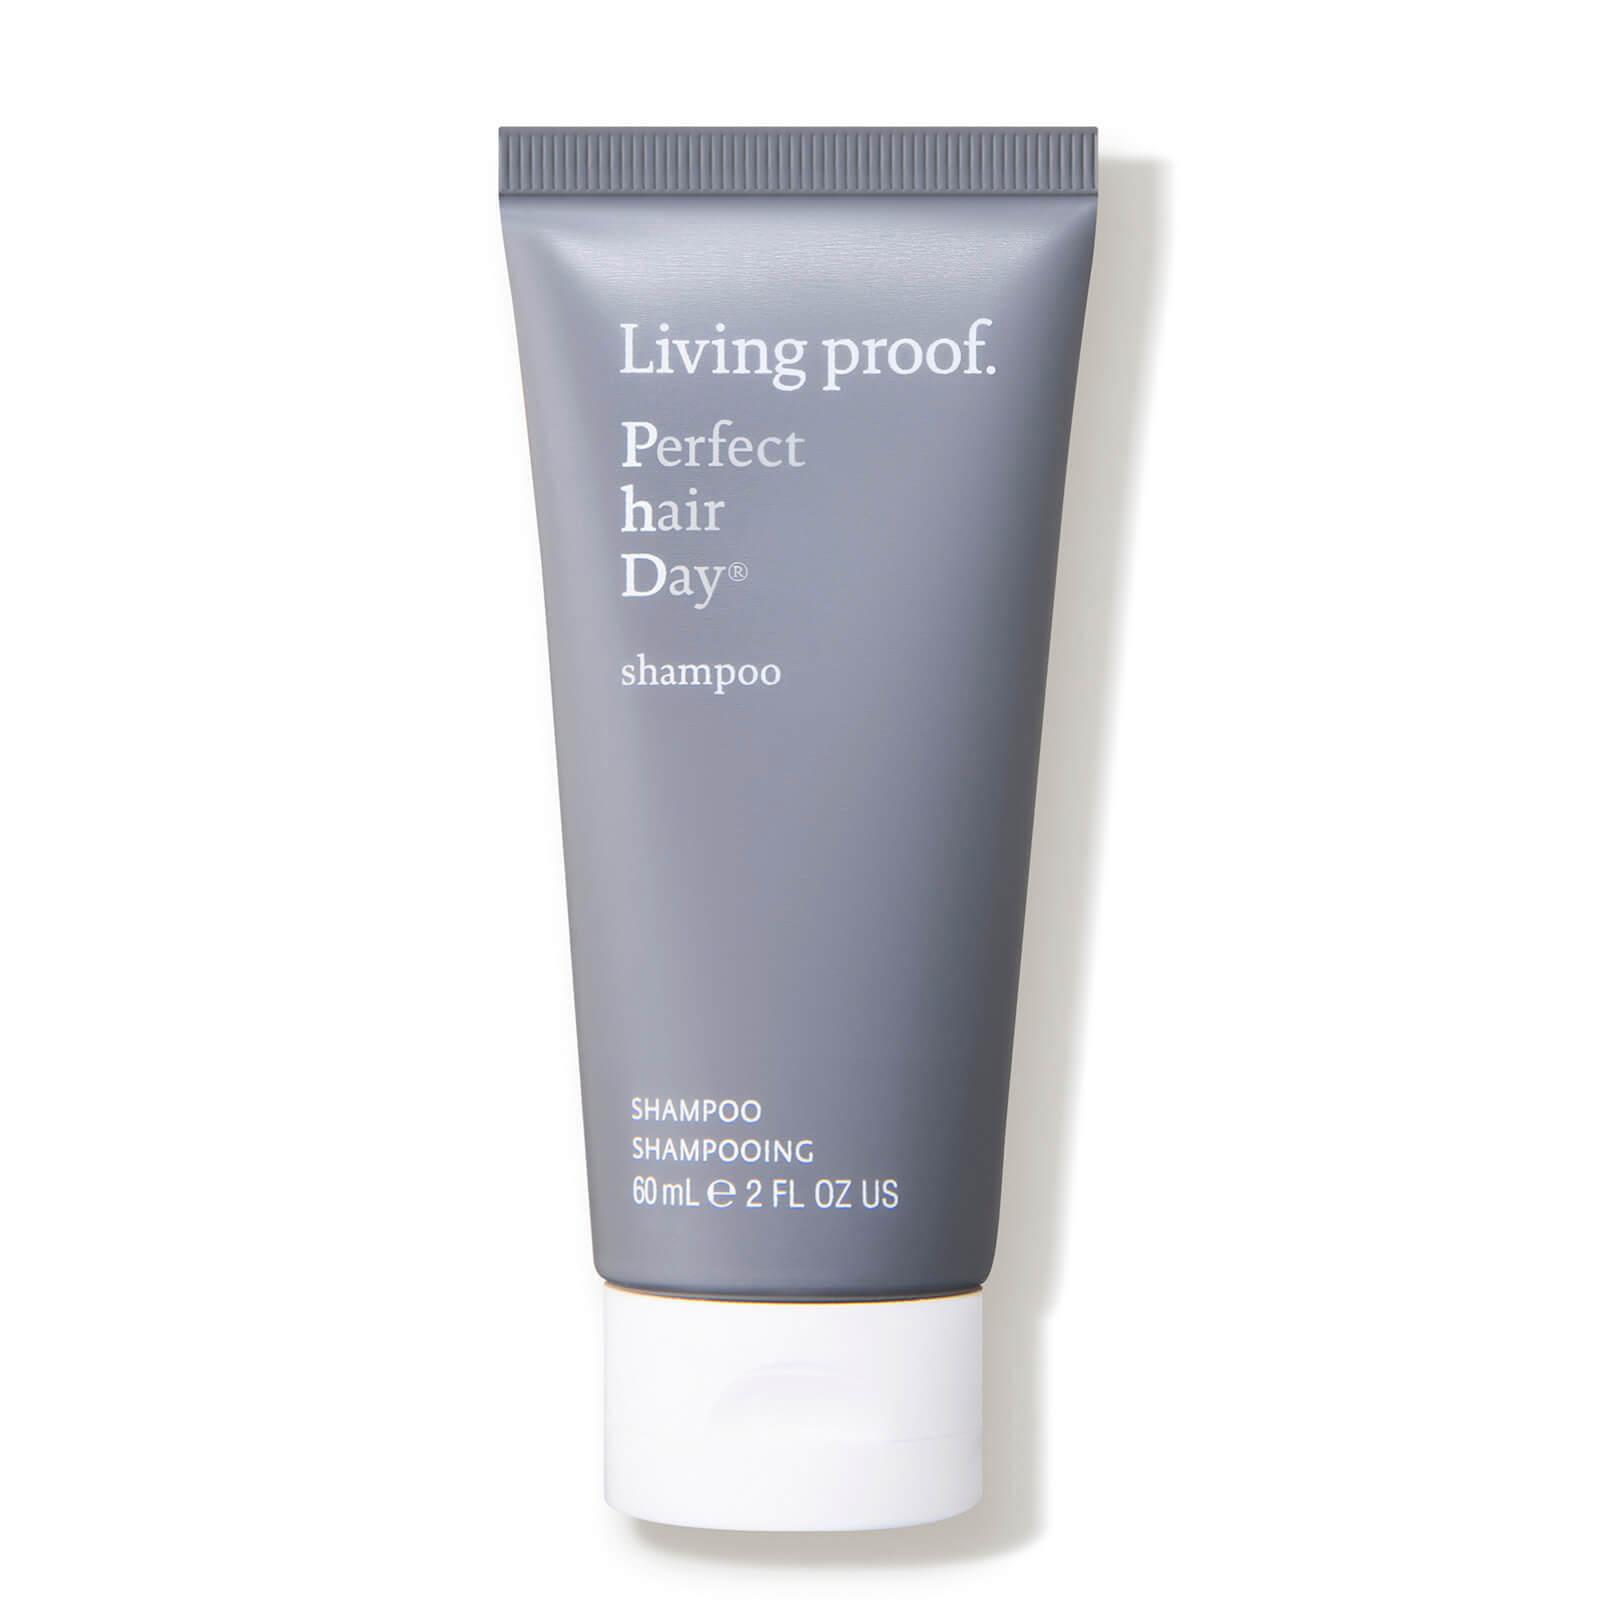 Living Proof Perfect Hair Day (PhD) Shampoo 60ml